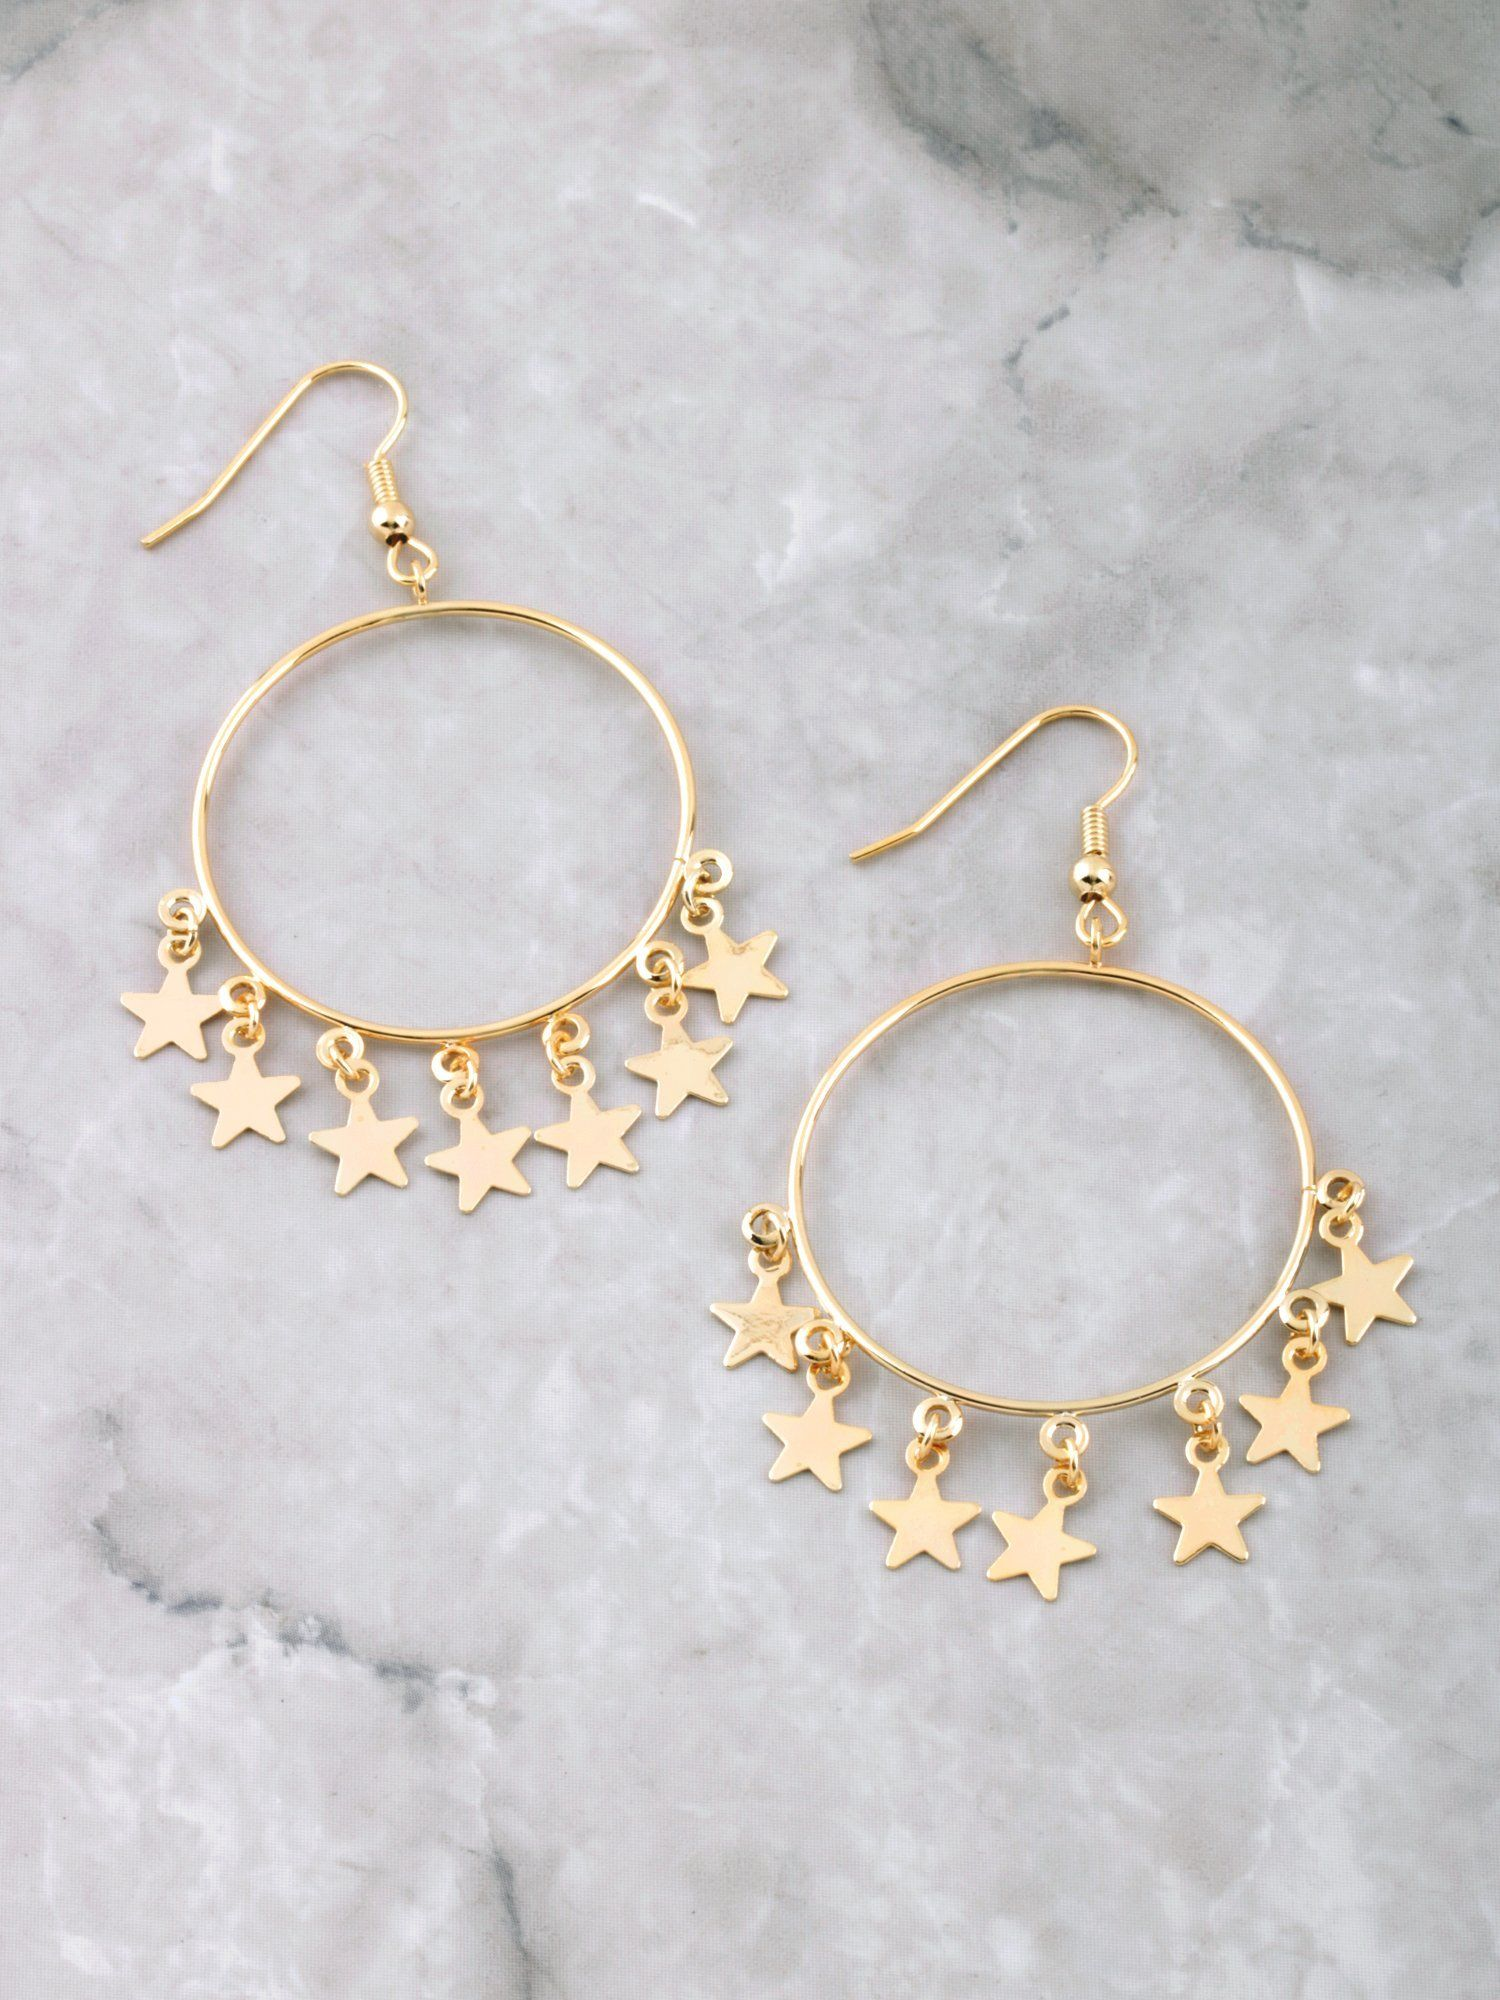 dc0389bb7 Hanging Stars Hoop Earrings | Jewelry | Hoop earrings, Jewelry ...